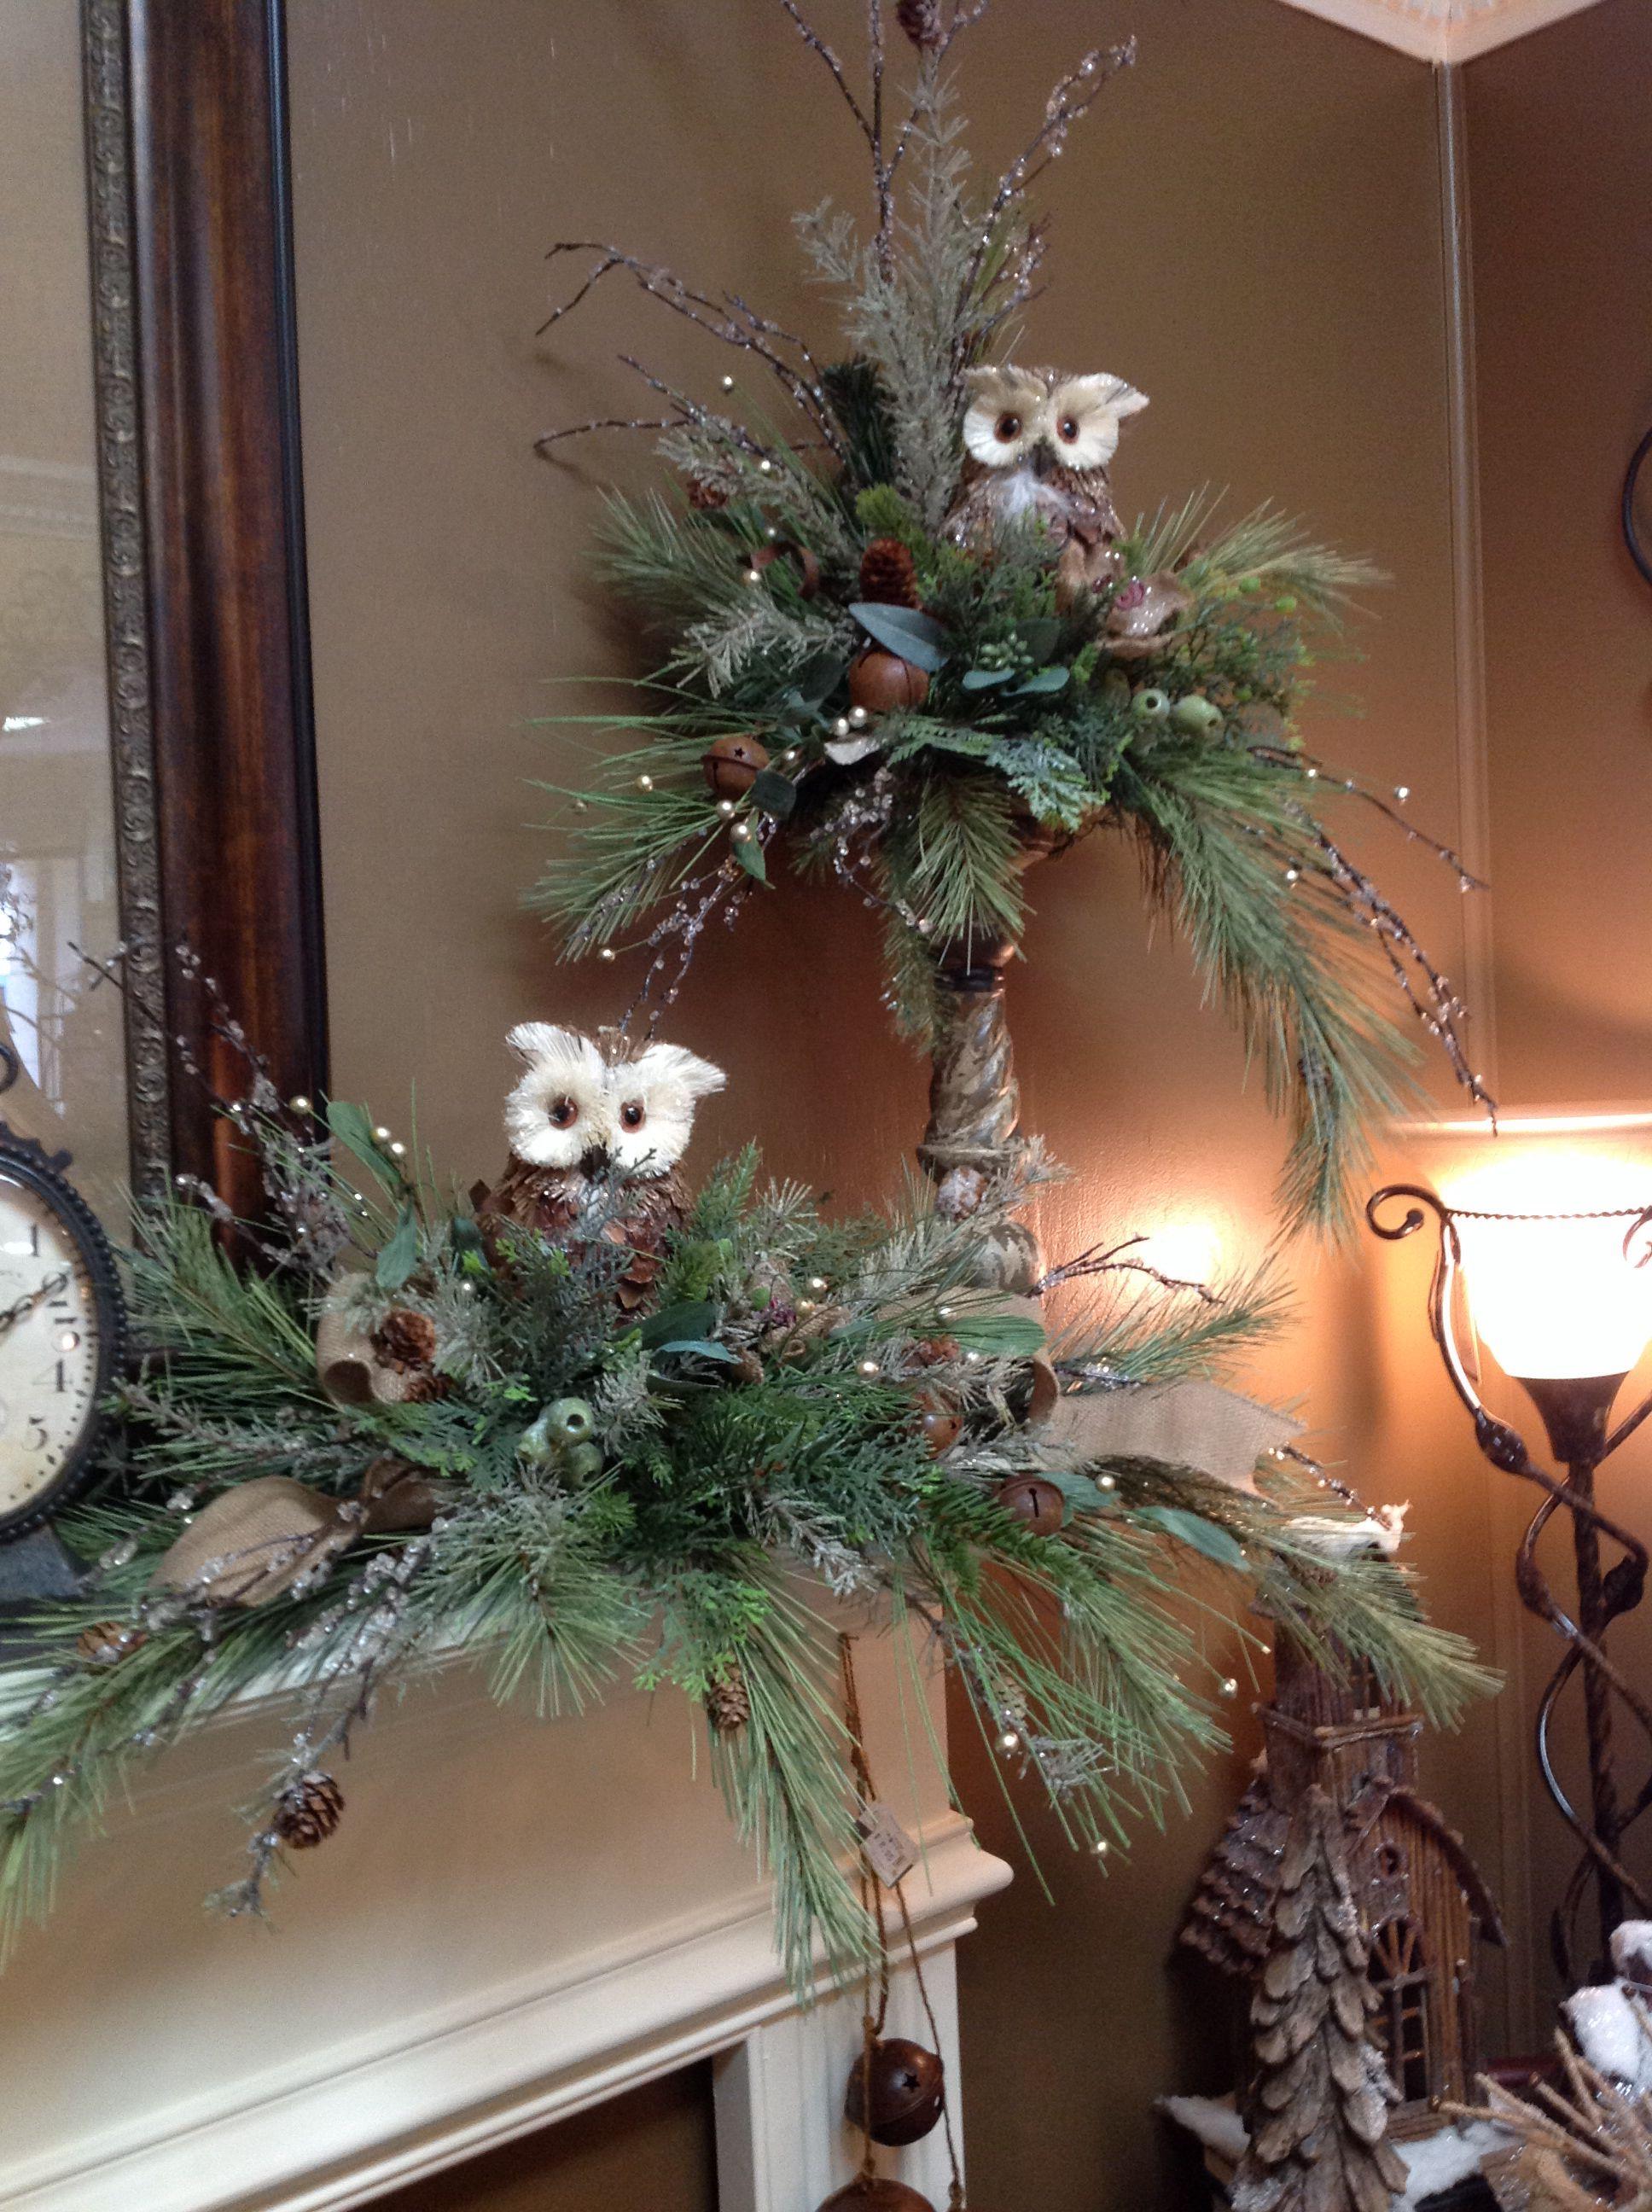 Owl floral arrangements on mantel in burlap room Great decorating